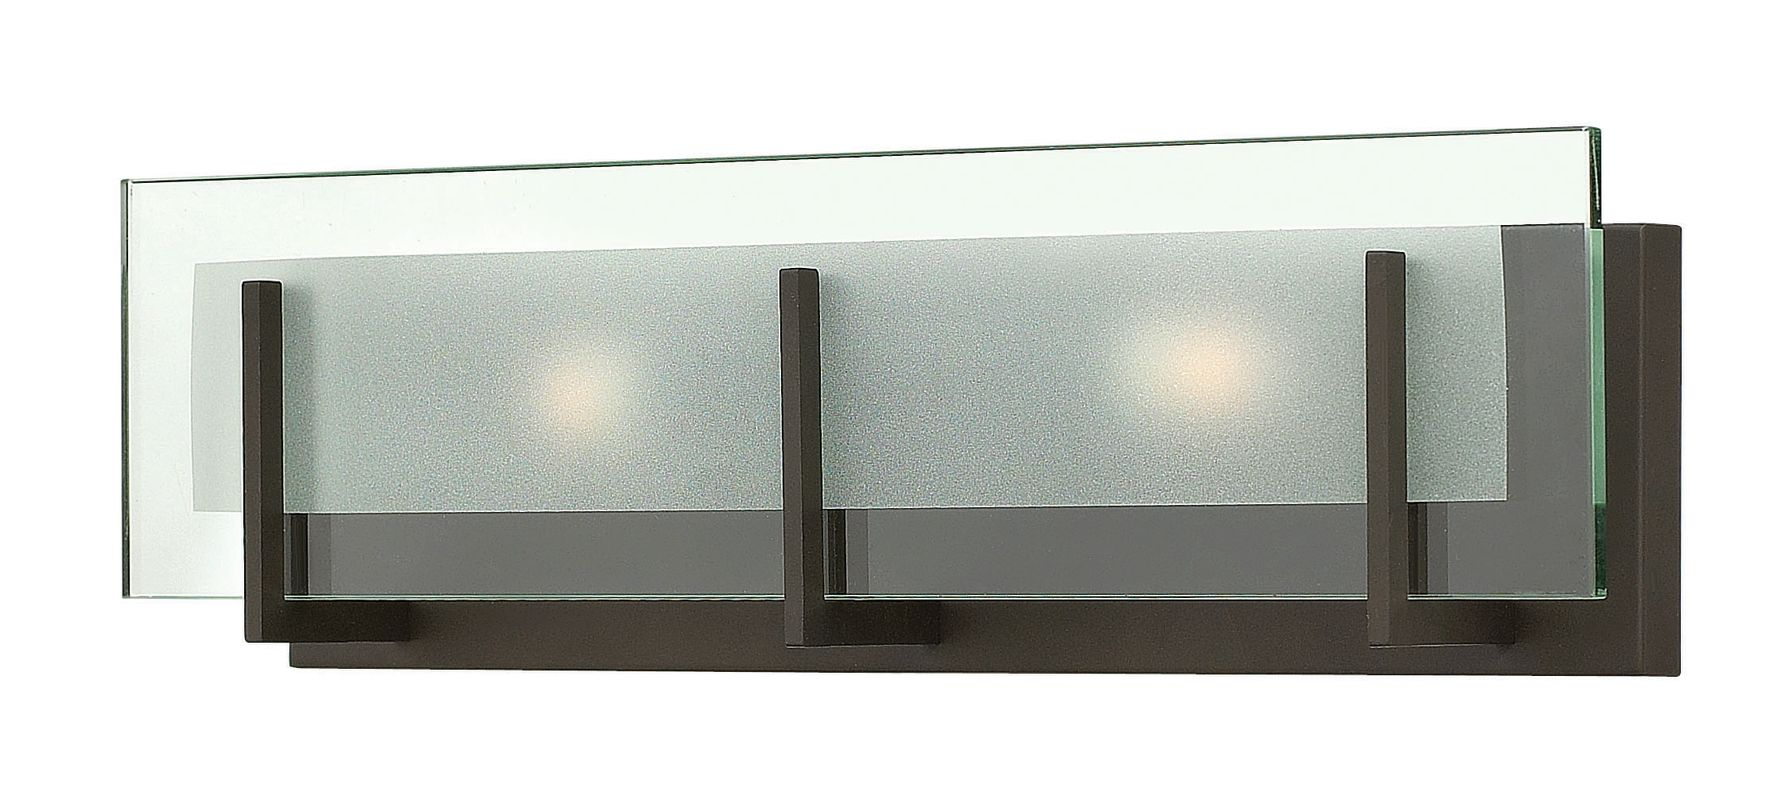 "Hinkley Lighting 5652-LED 2 Light 18"" Width ADA Compliant LED Bath Bar"